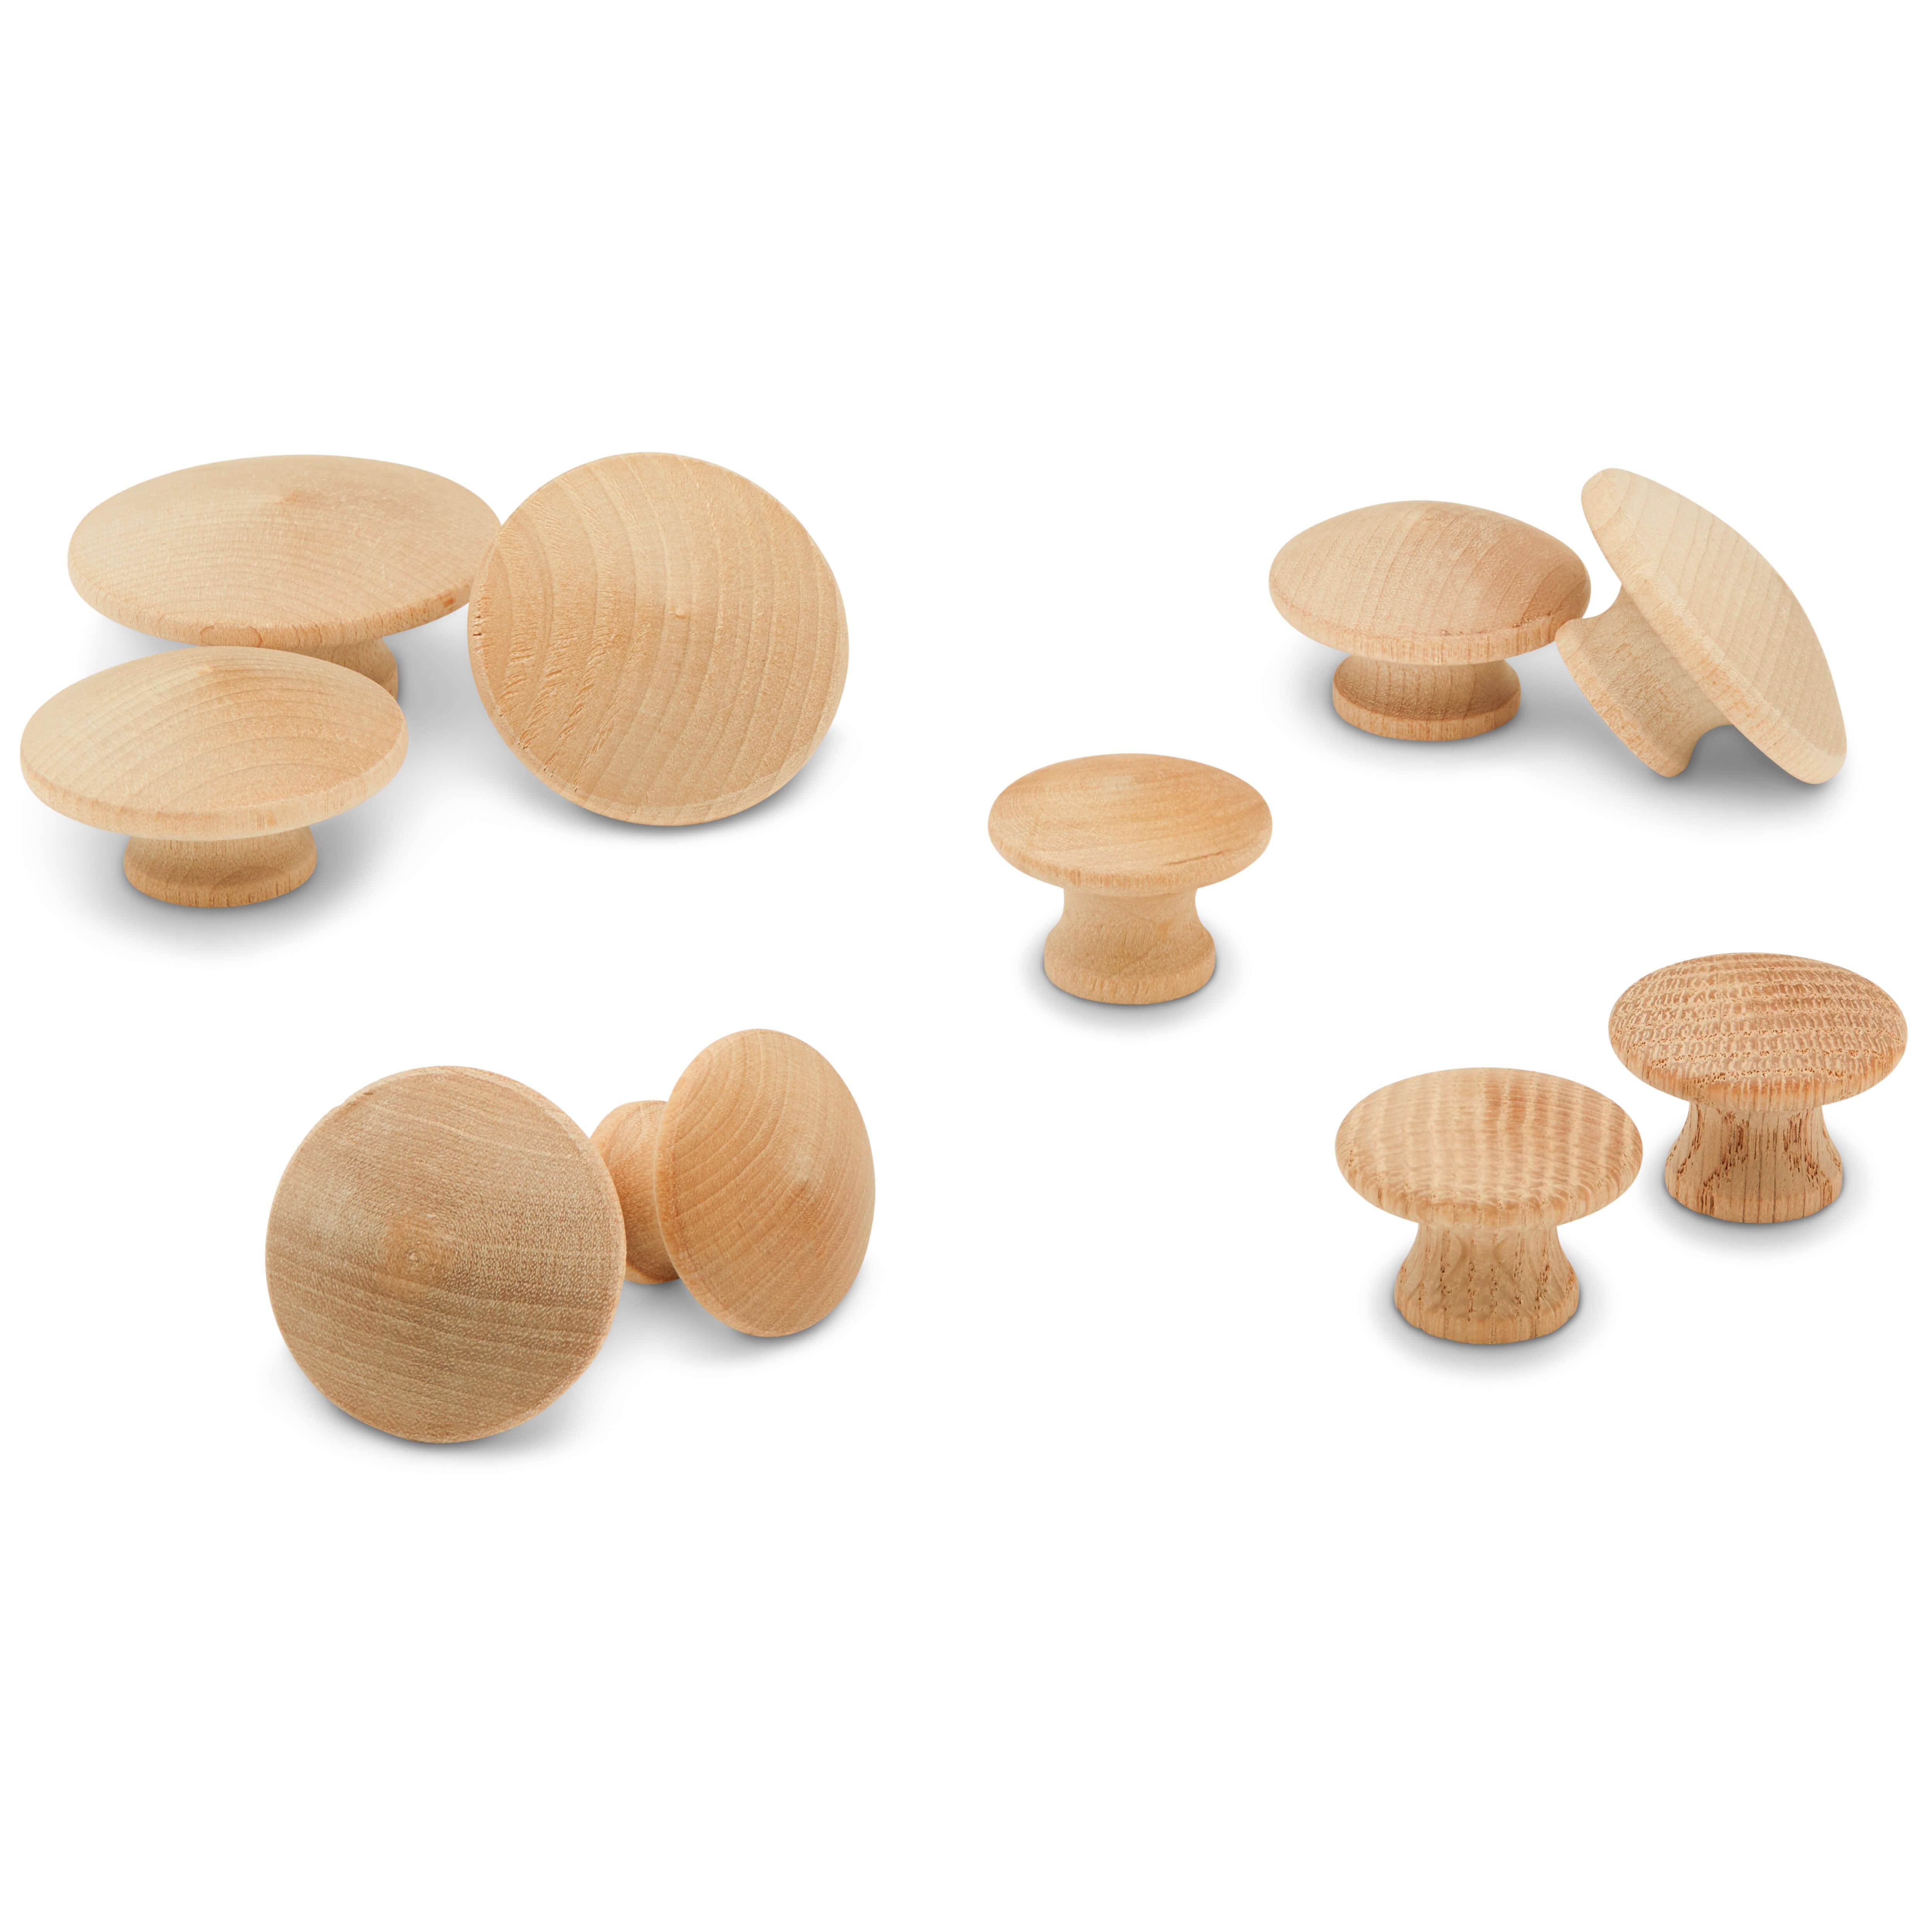 End Grain Wood Knobs